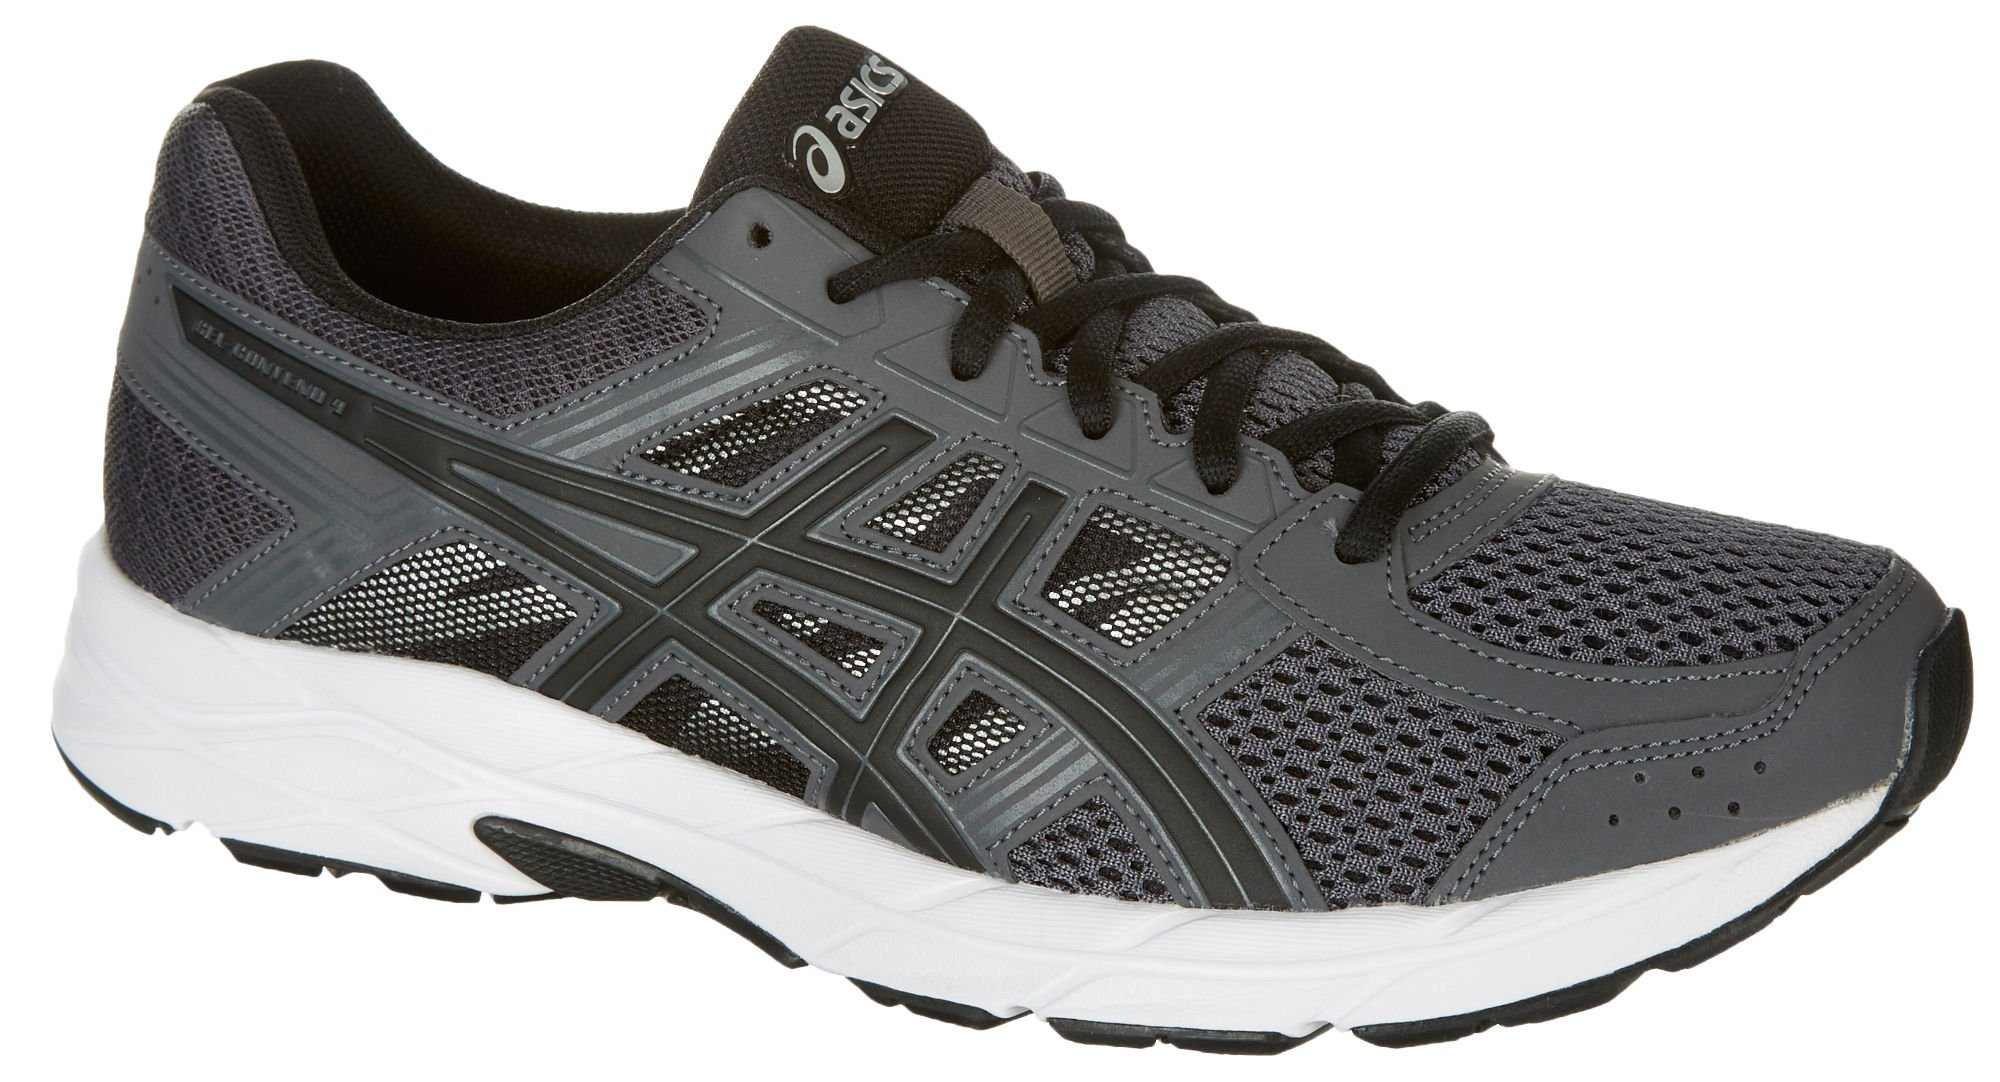 ASICS Mens Gel-Contend 4 Running Shoe, Dark Grey/Black/Carbon, 7.5 Medium US